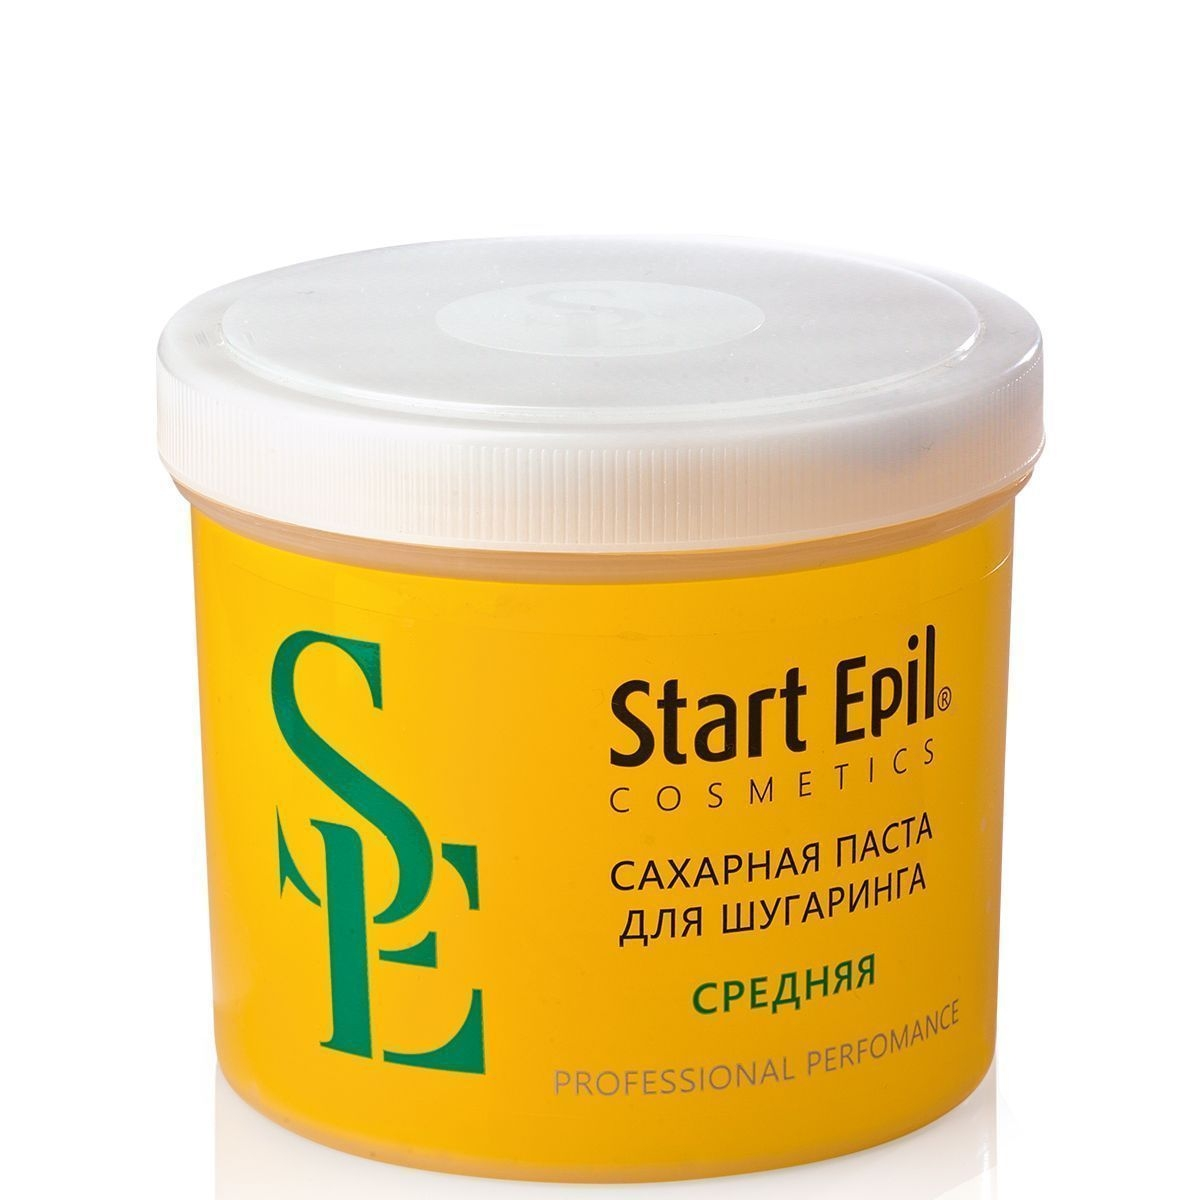 ARAVIA Паста Start Epil Сахарная для Депиляции Средняя, 750 гр